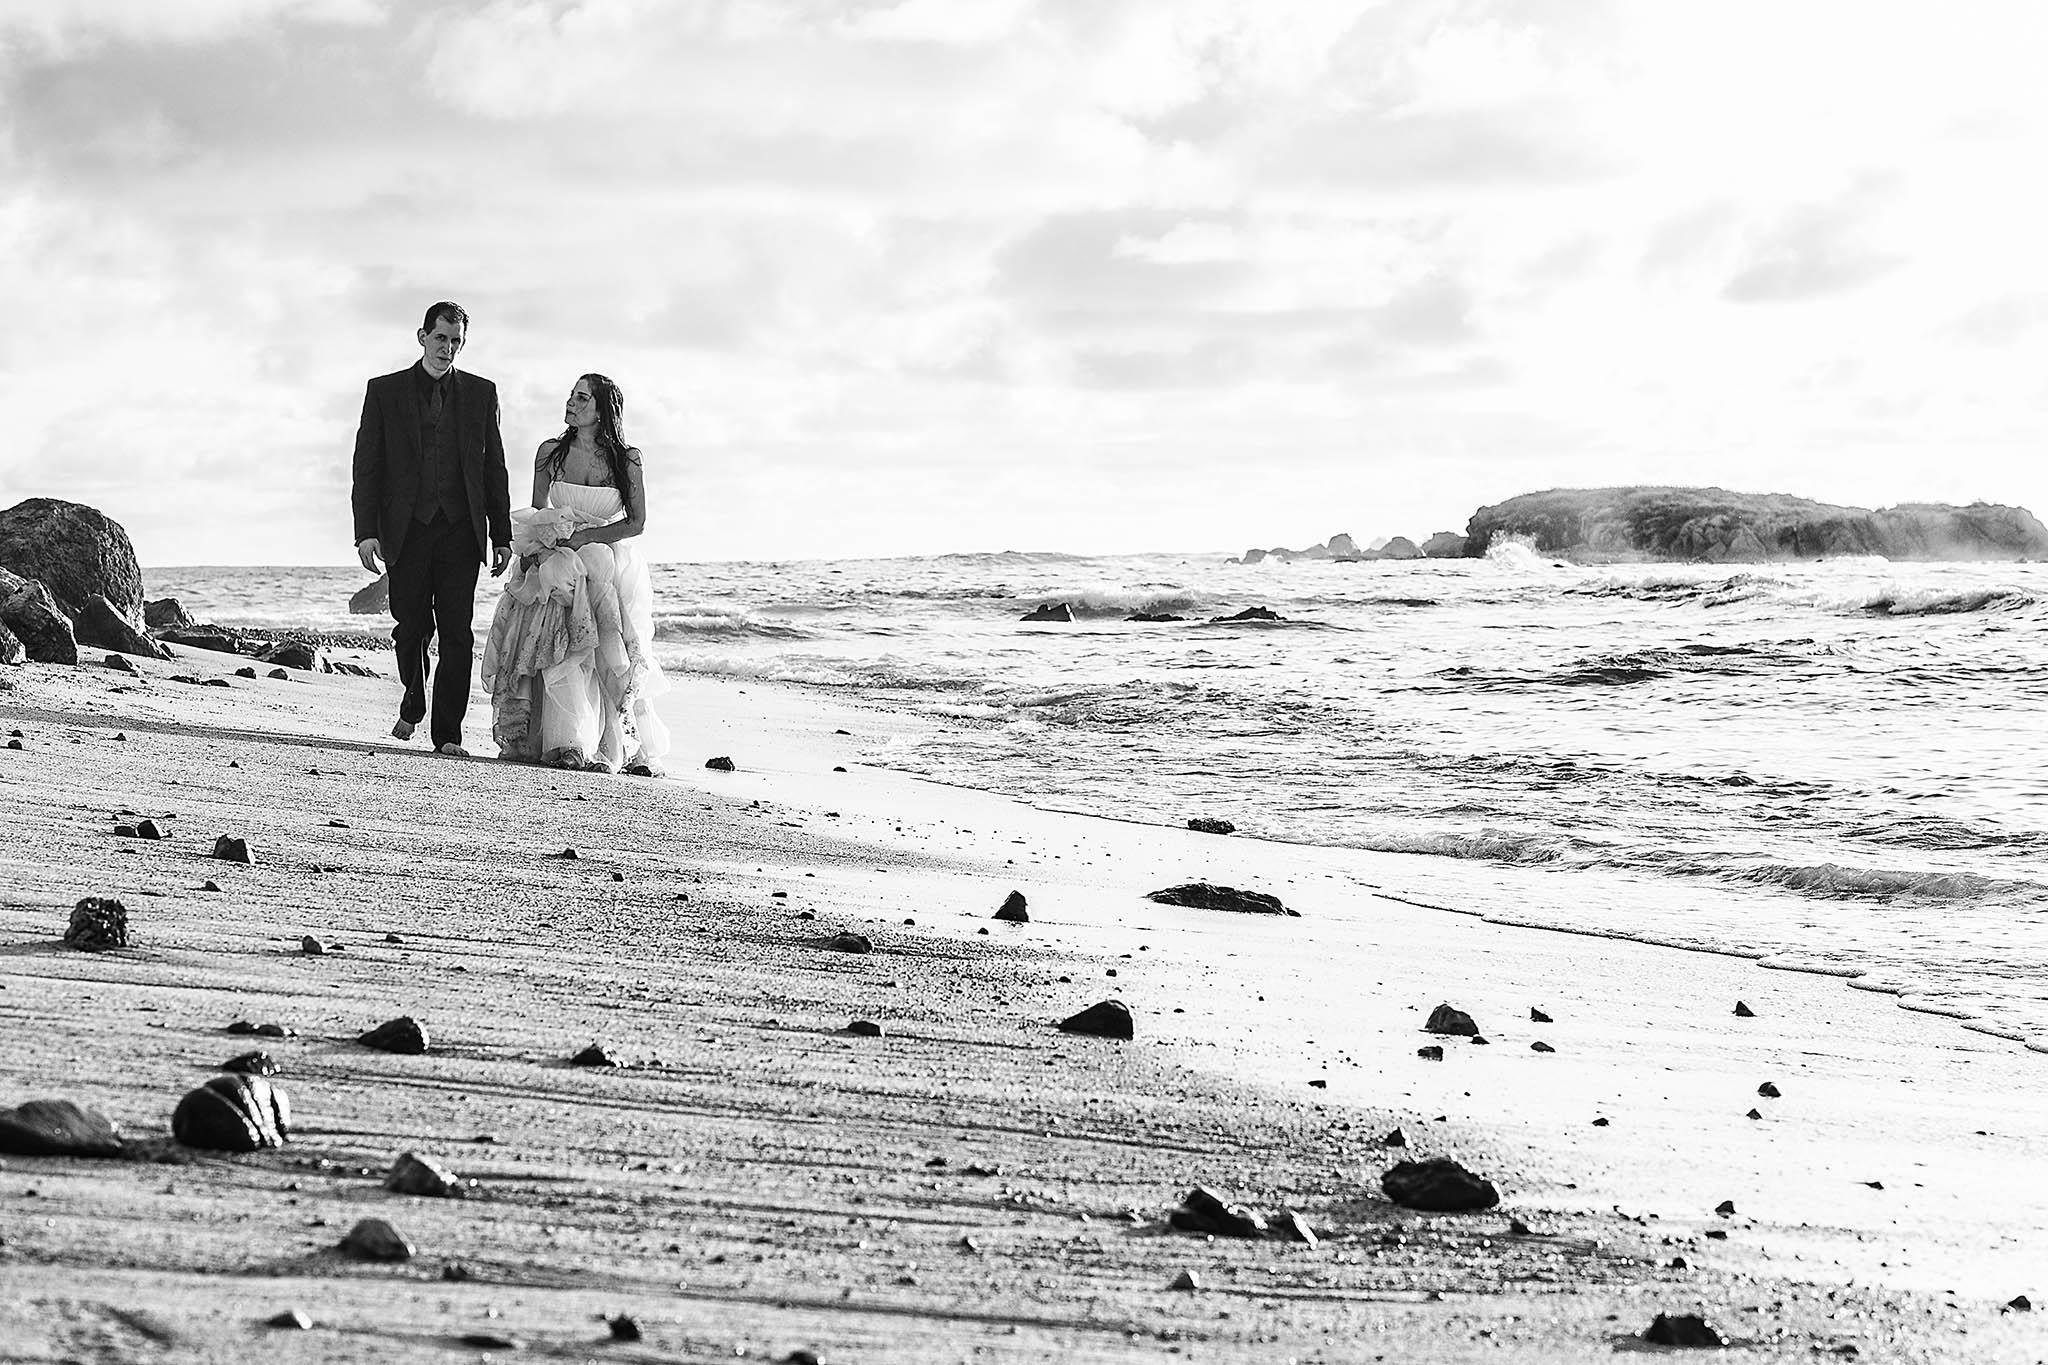 St. Regis Punta de Mita Weddings